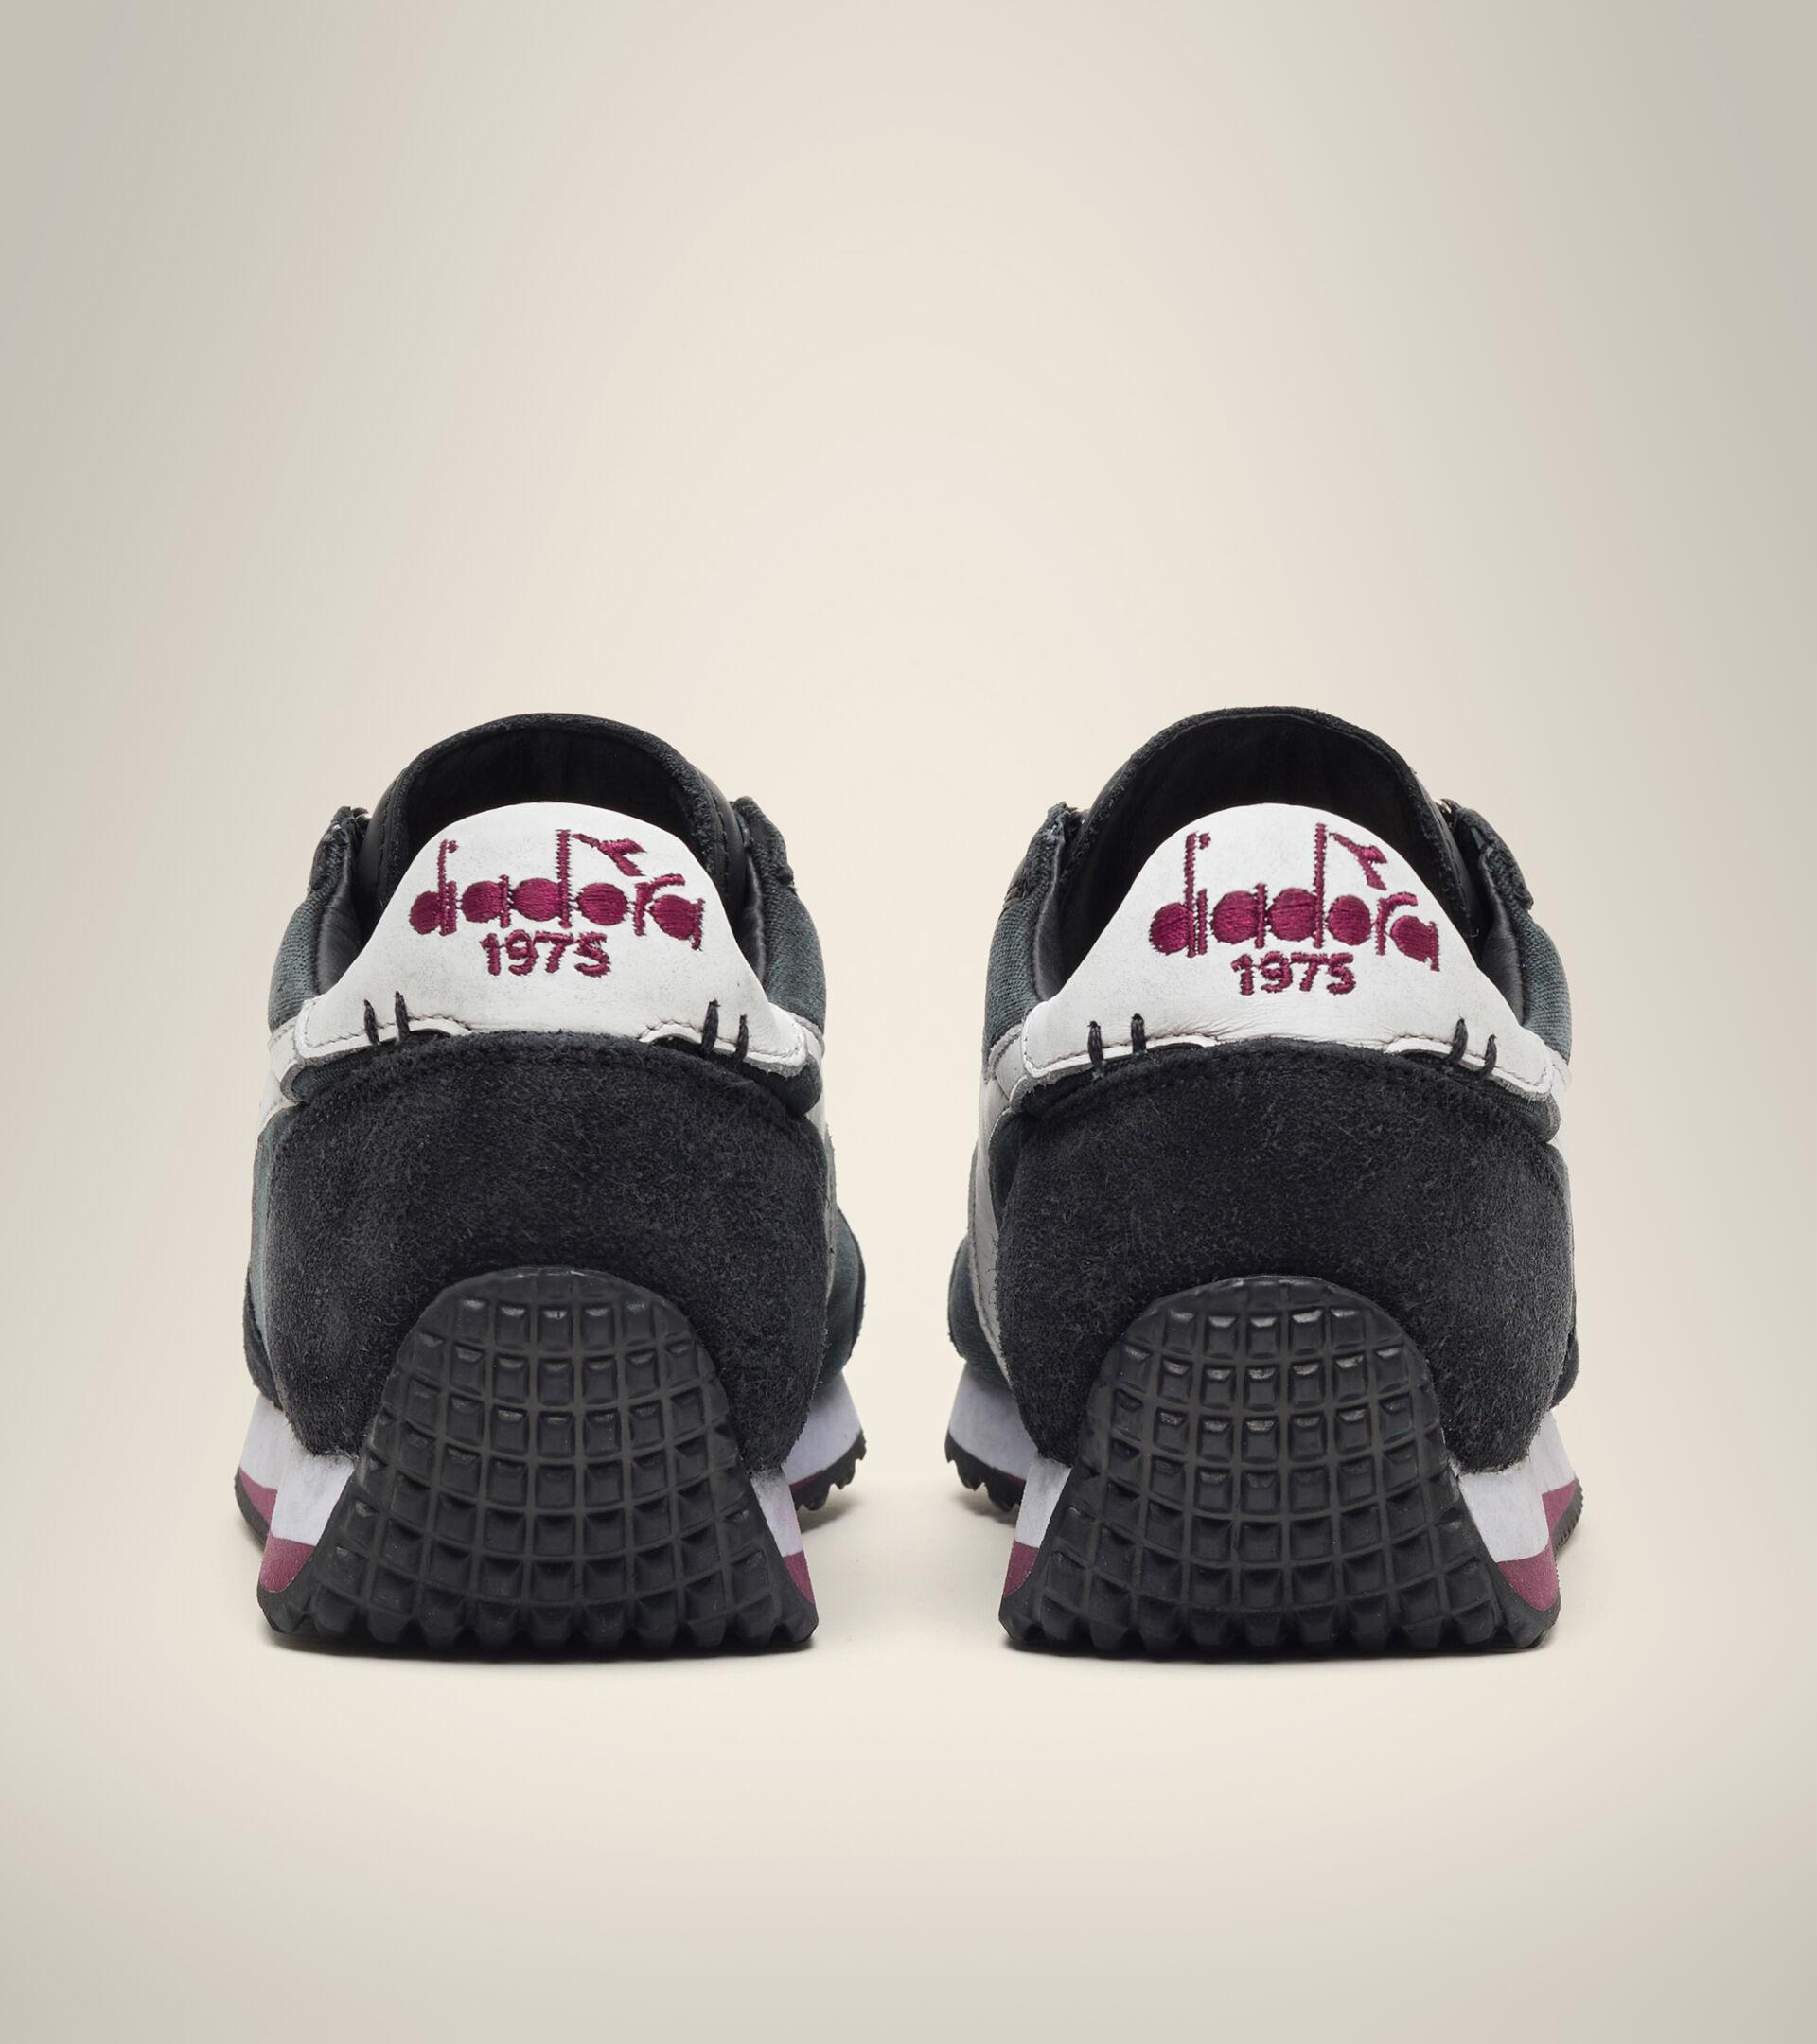 Footwear Heritage UNISEX EQUIPE H DIRTY STONE WASH EVO TINTA NEGRA Diadora